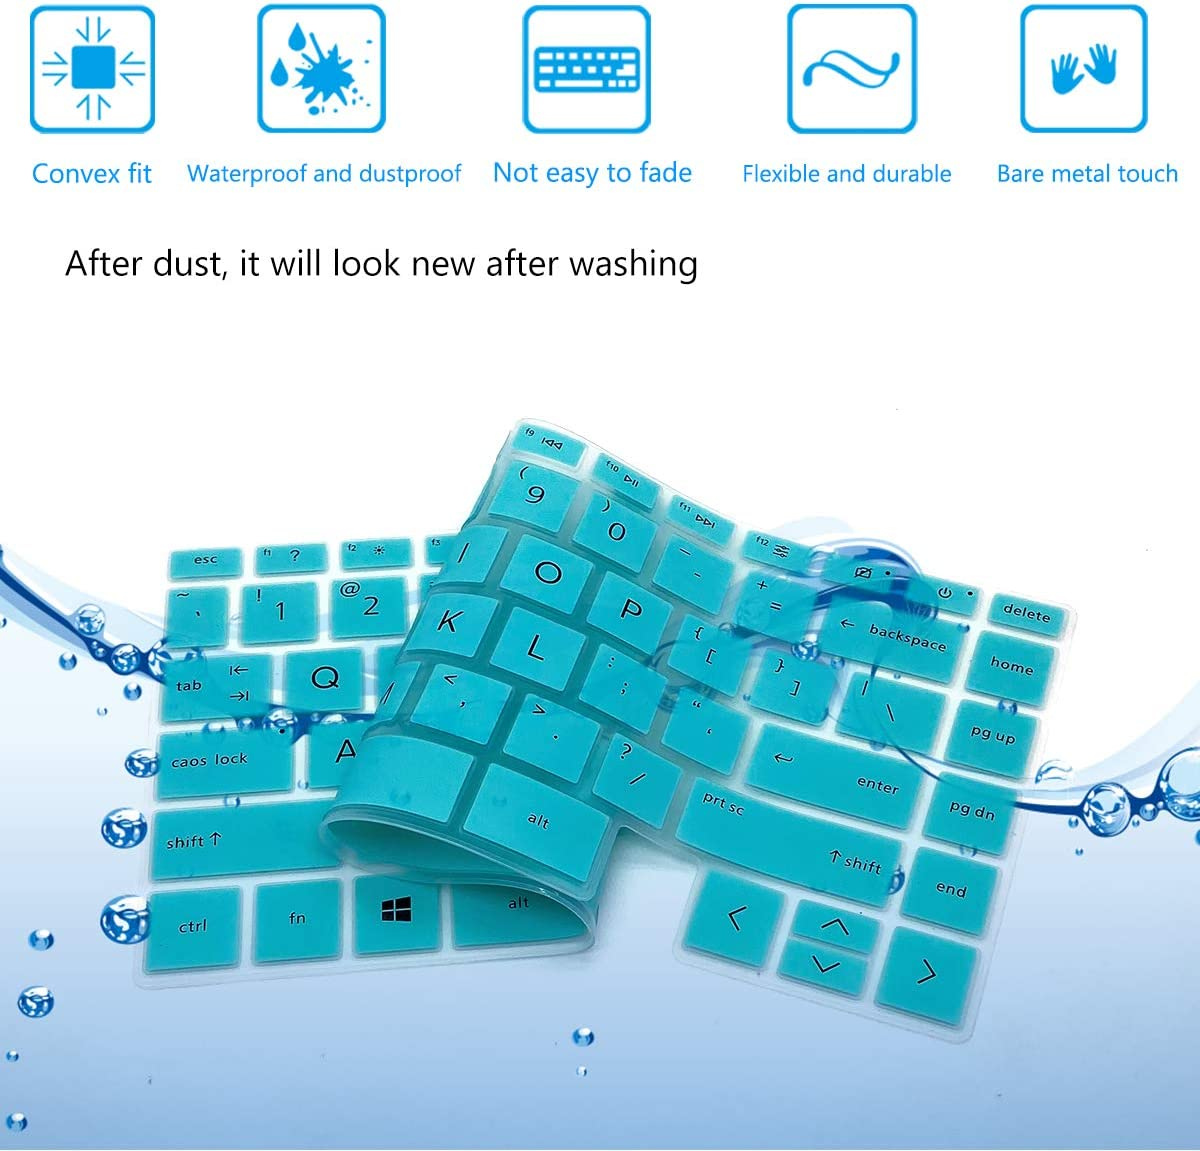 2PCS Keyboard Cover for HP Envy x360 13 2-in-1 Fingerprint Reader(No Numeric Keypad) HP Envy 14 14t/14-ebxxxx Series 14t-eb000 14-eb0010nr eb0003ns, HP Envy 13/13t-ba 13/13m-bd 13/13z-ay Series